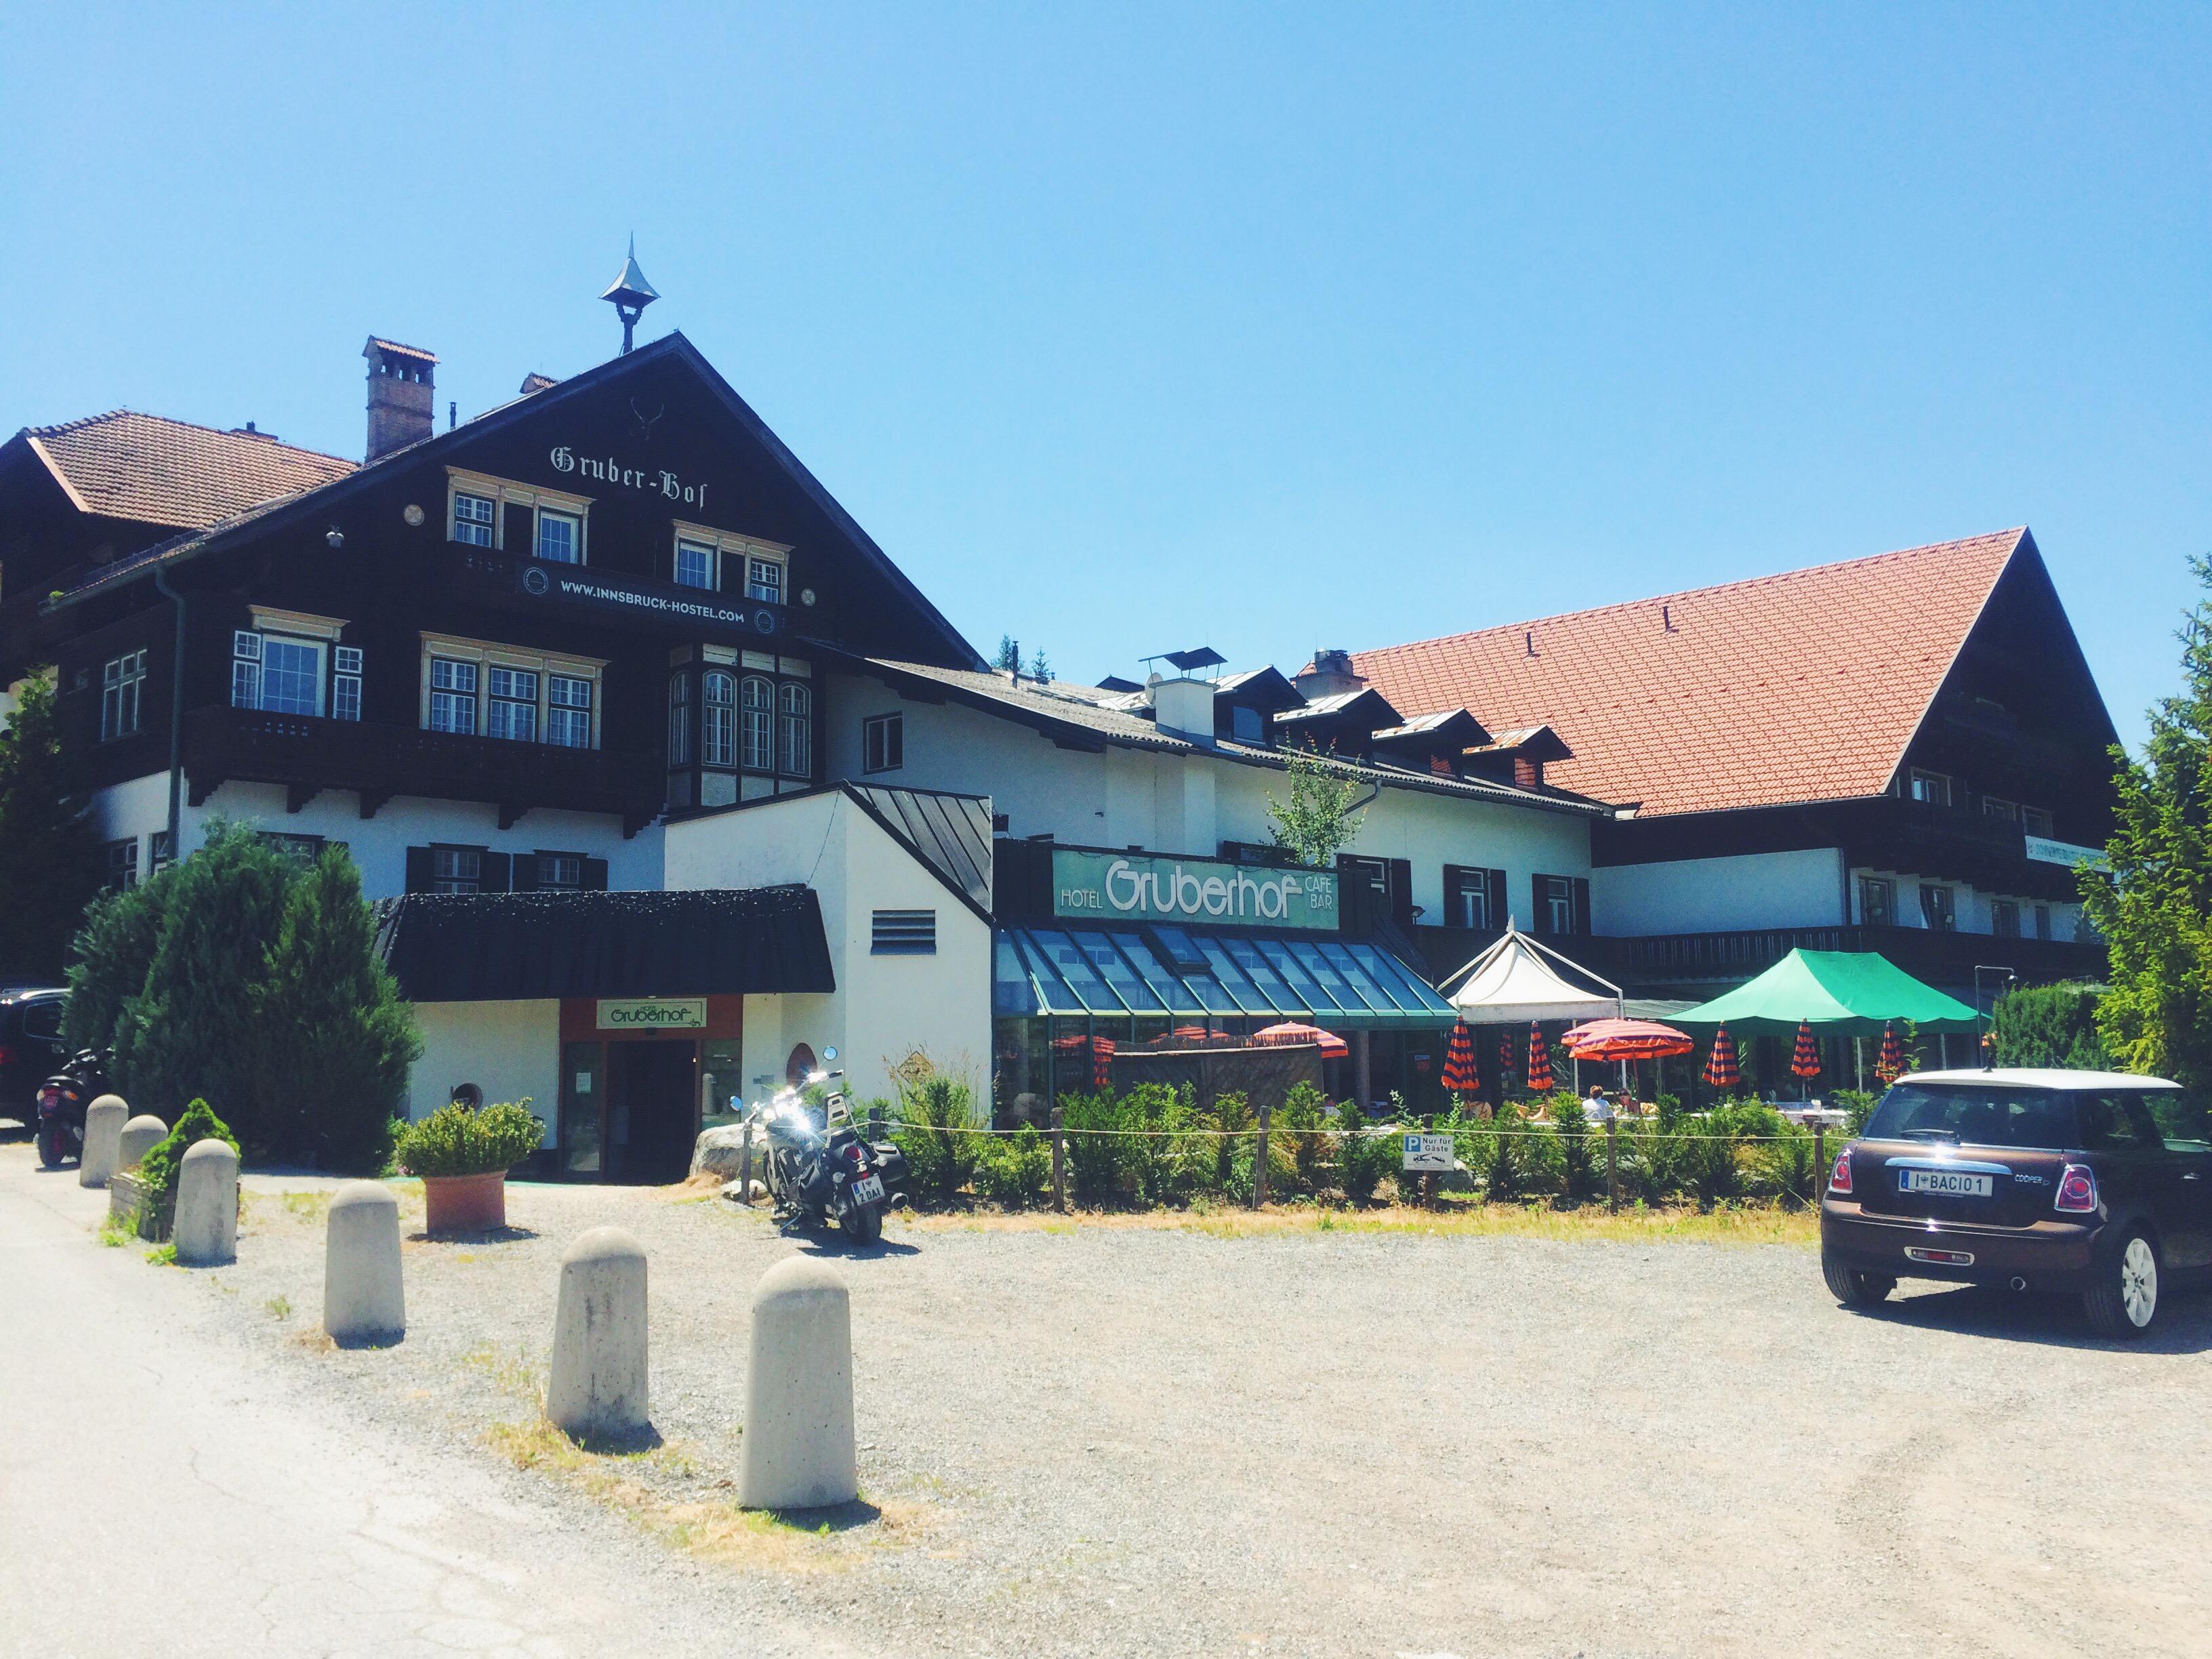 Hotel Gruberhof in Igls